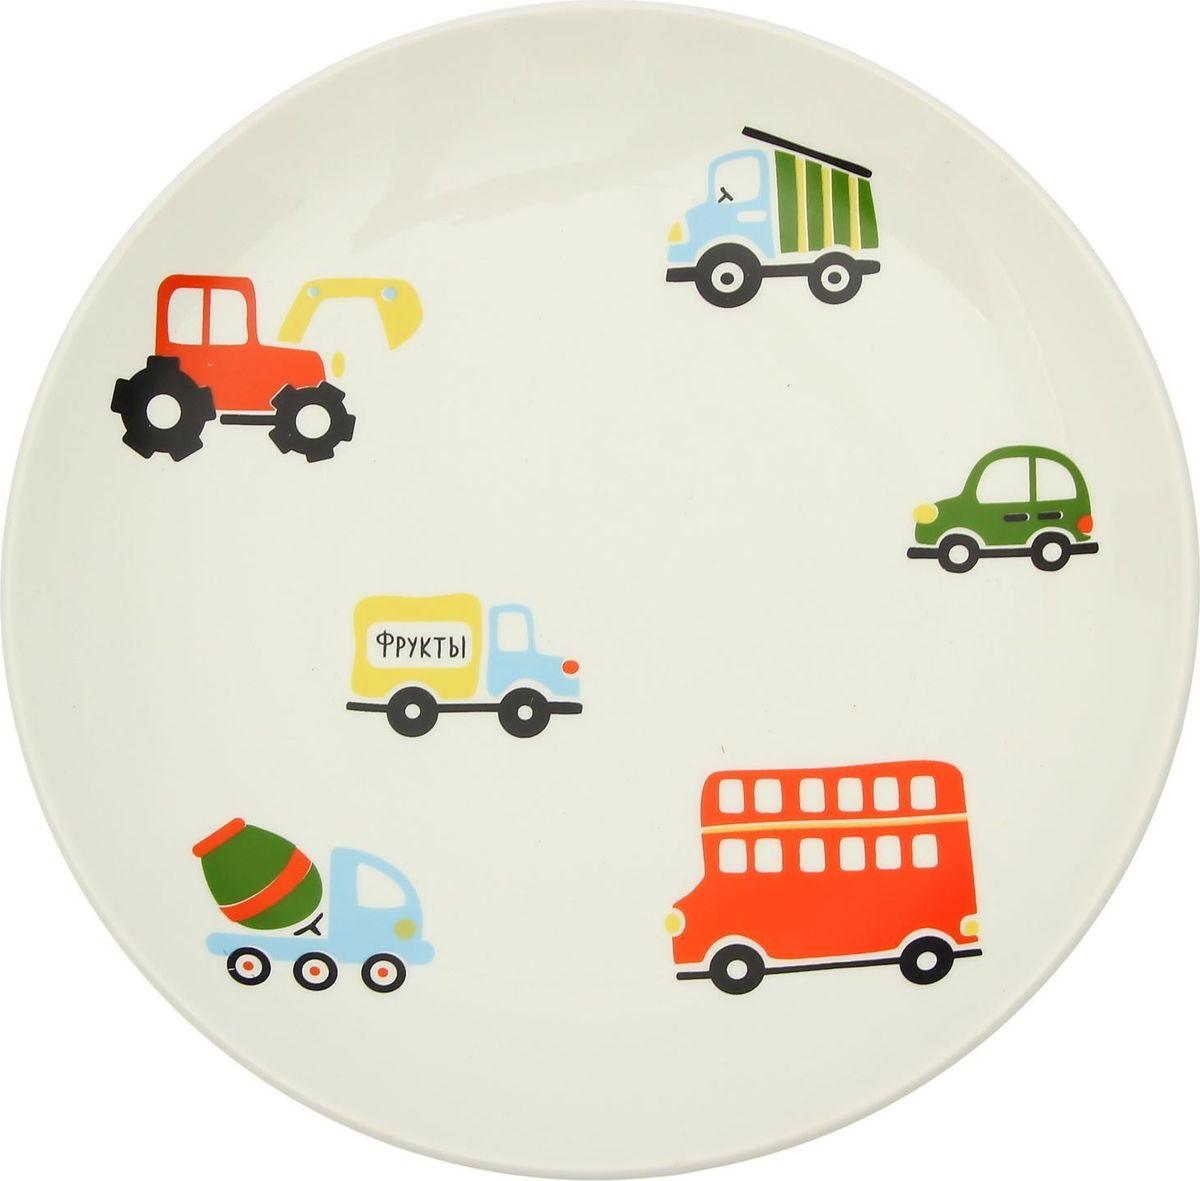 Тарелка Сотвори Чудо Машинки, диаметр 22 см тарелка сотвори чудо город любви диаметр 22 см